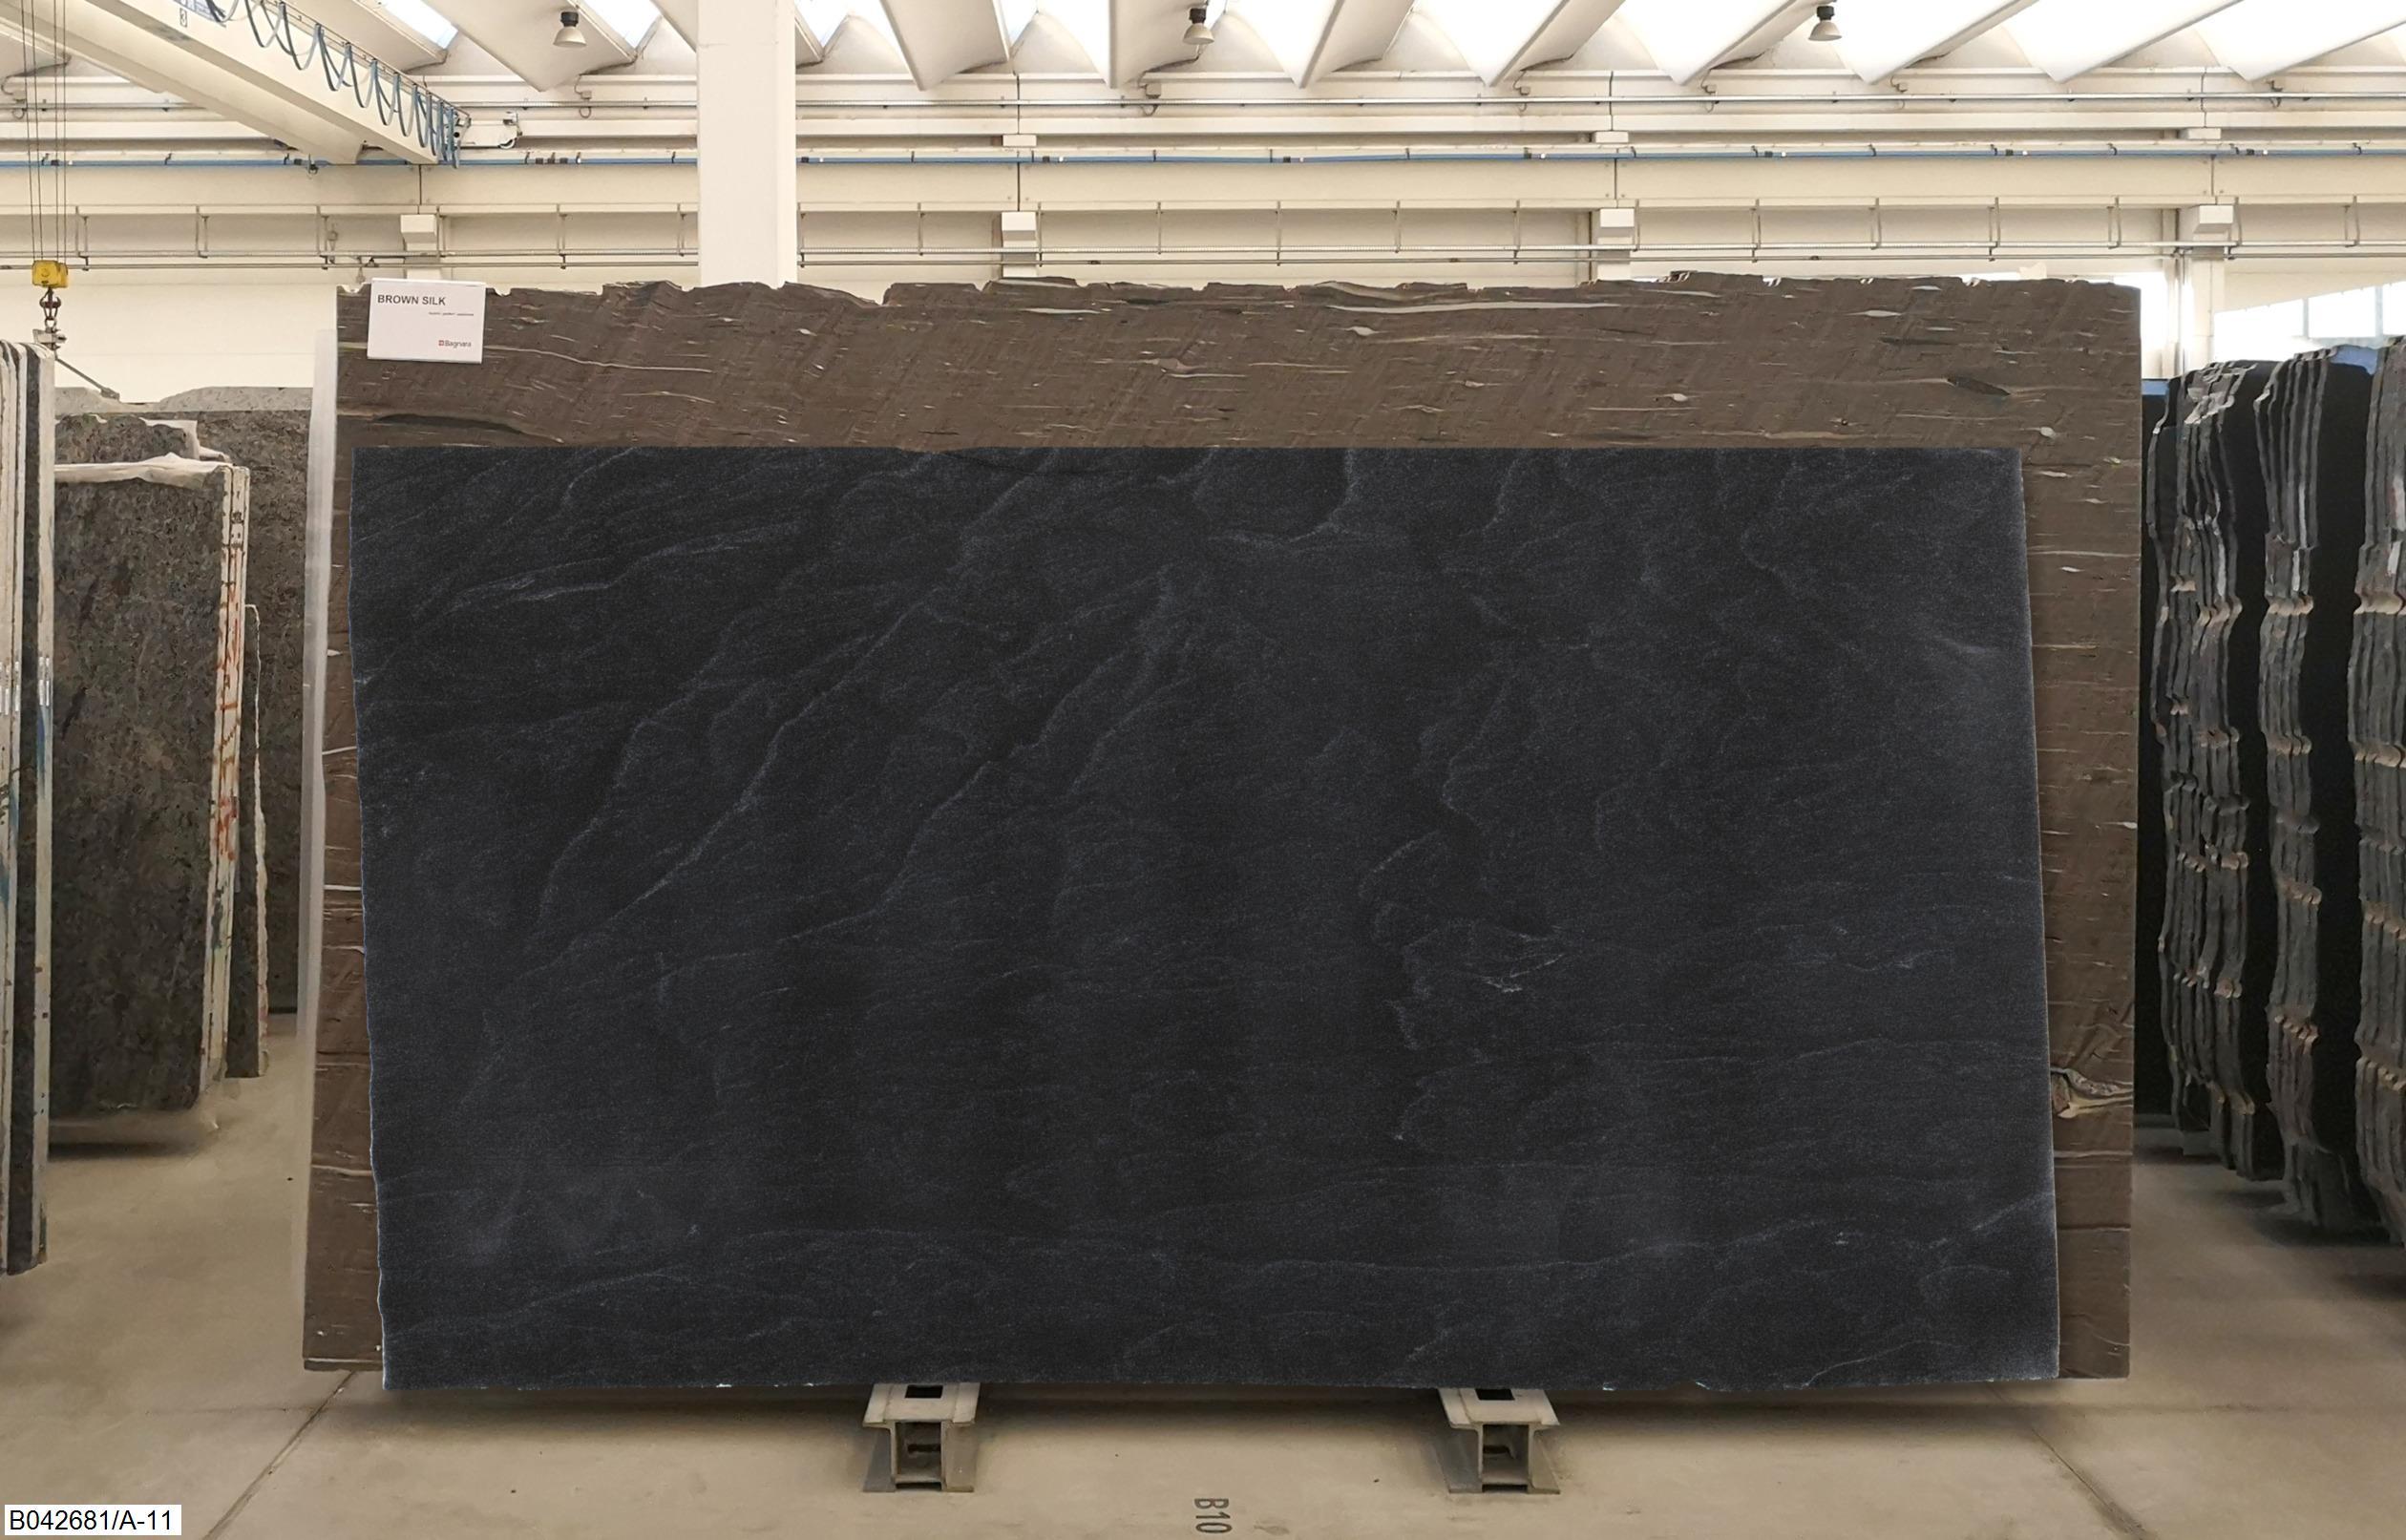 AMERICAN BLACK FANTASTIC - LASTRE LUCIDE Foto: 1_59681_39224.jpg